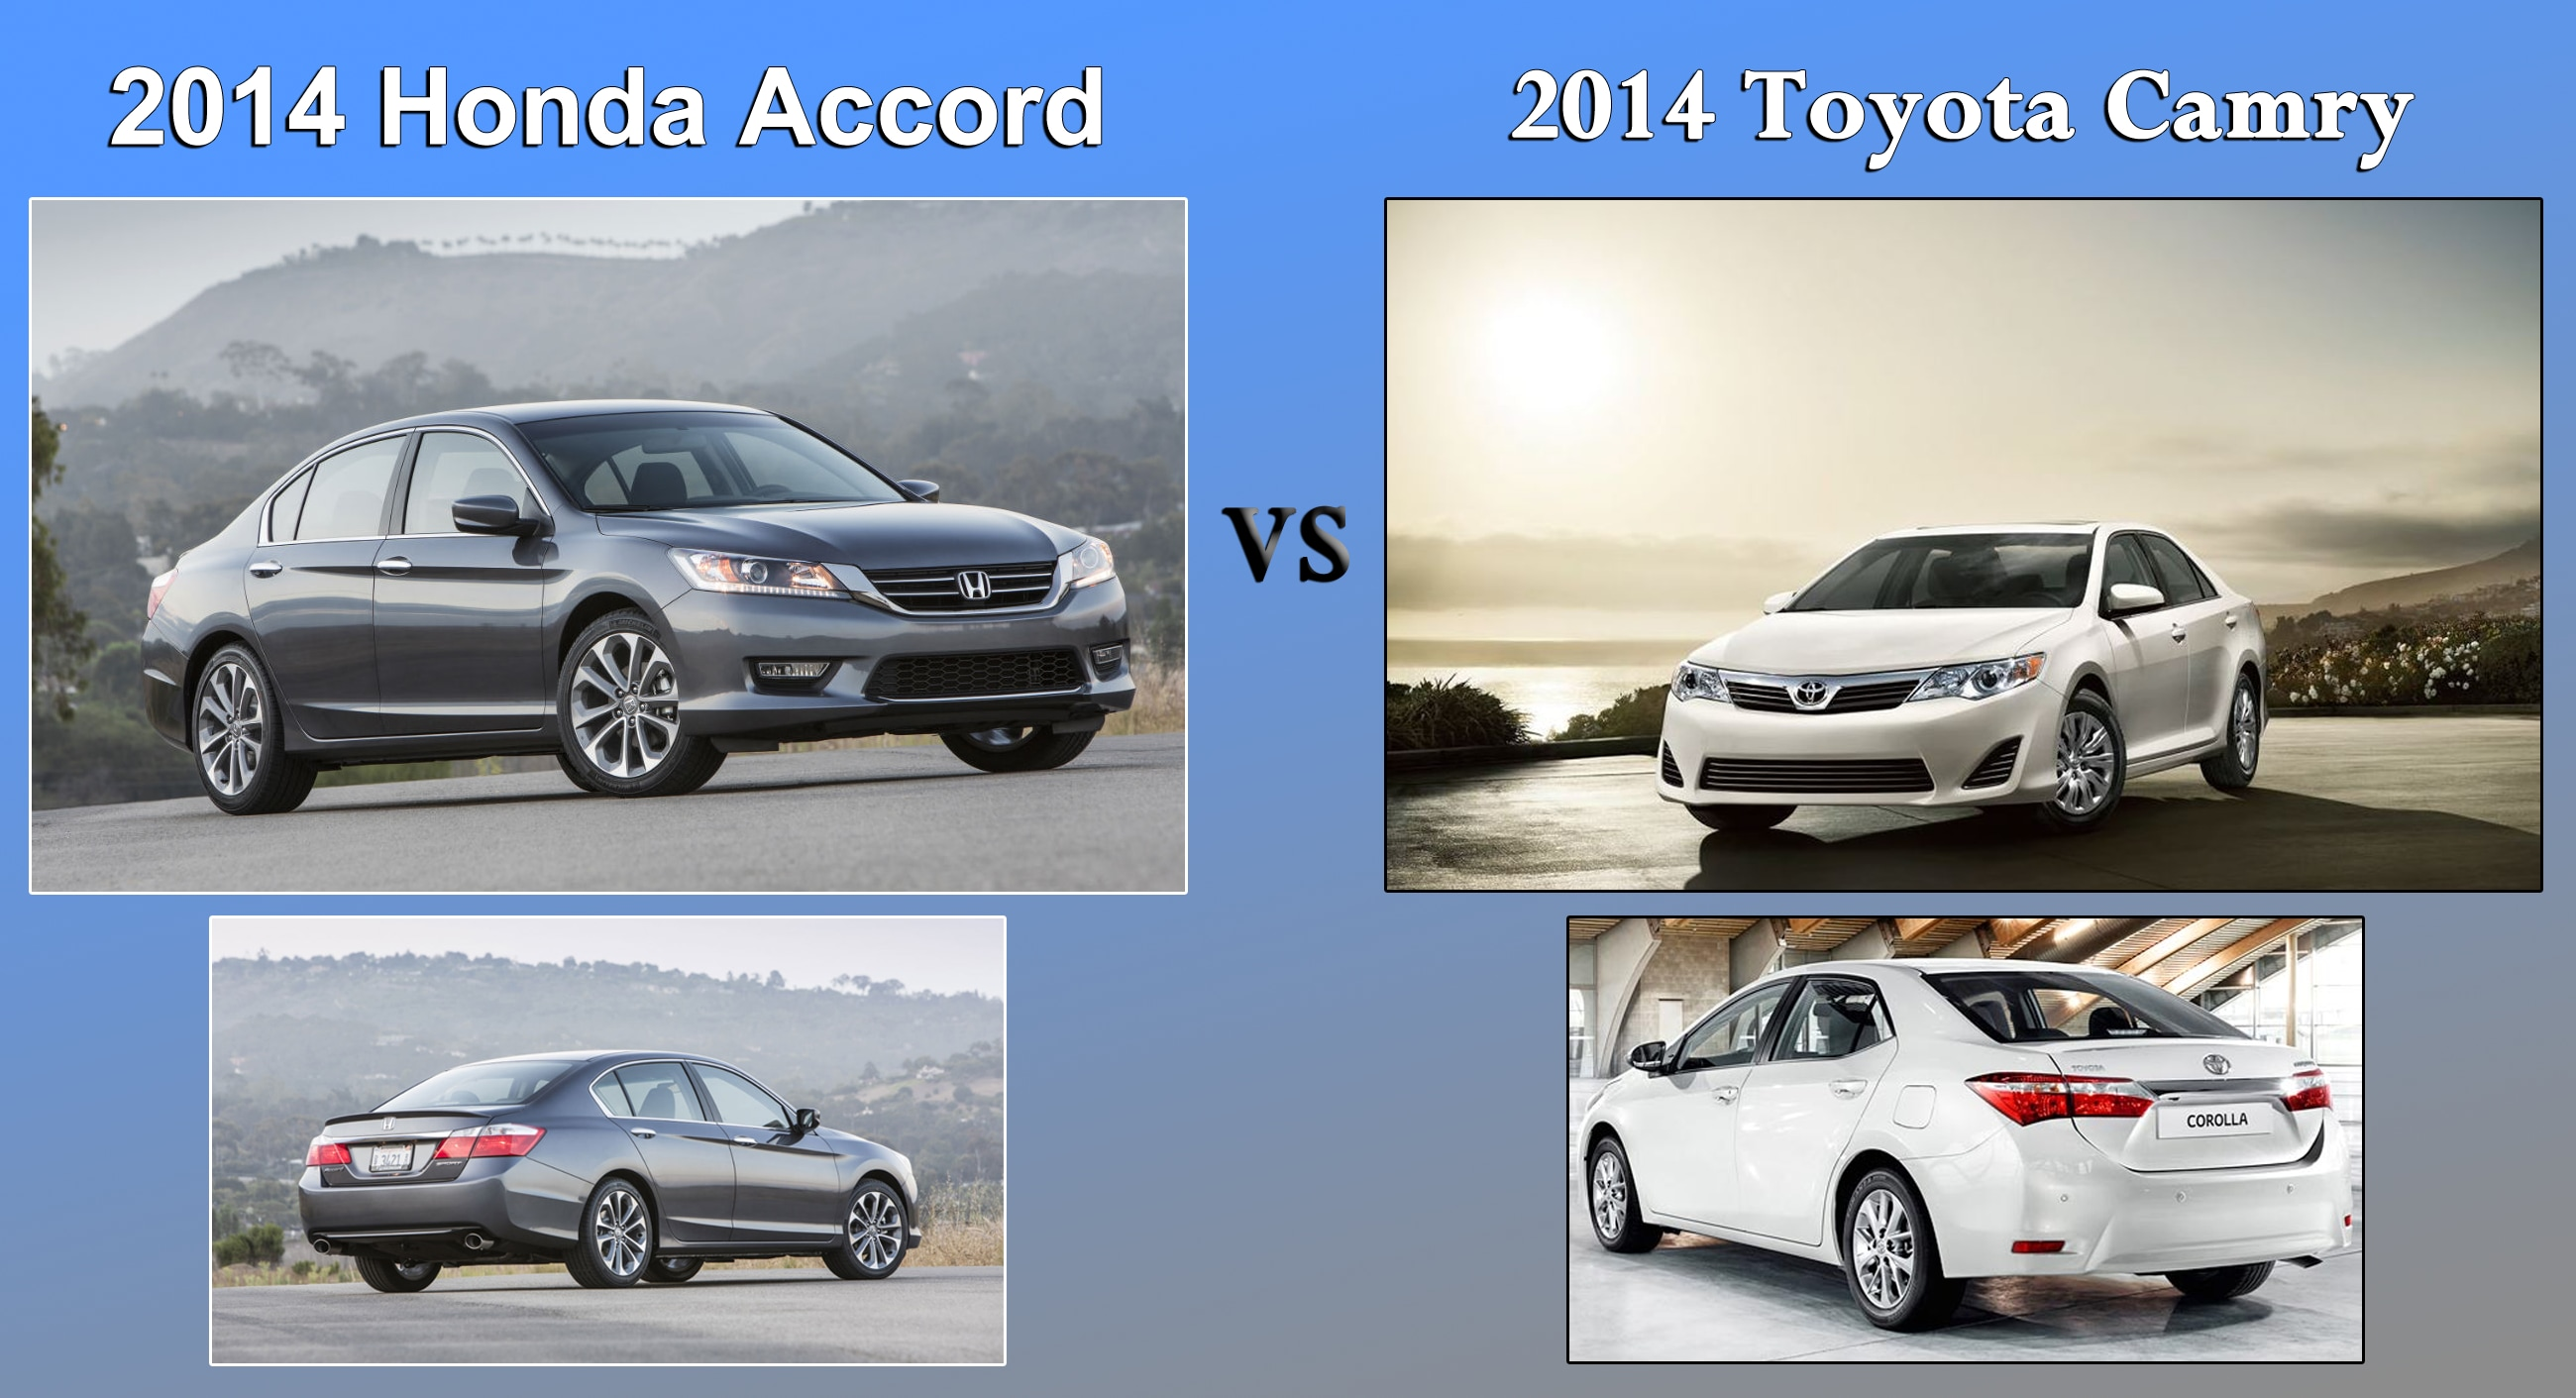 Sedan Comparison 2014 Honda Accord Vs 2014 Toyota Camry